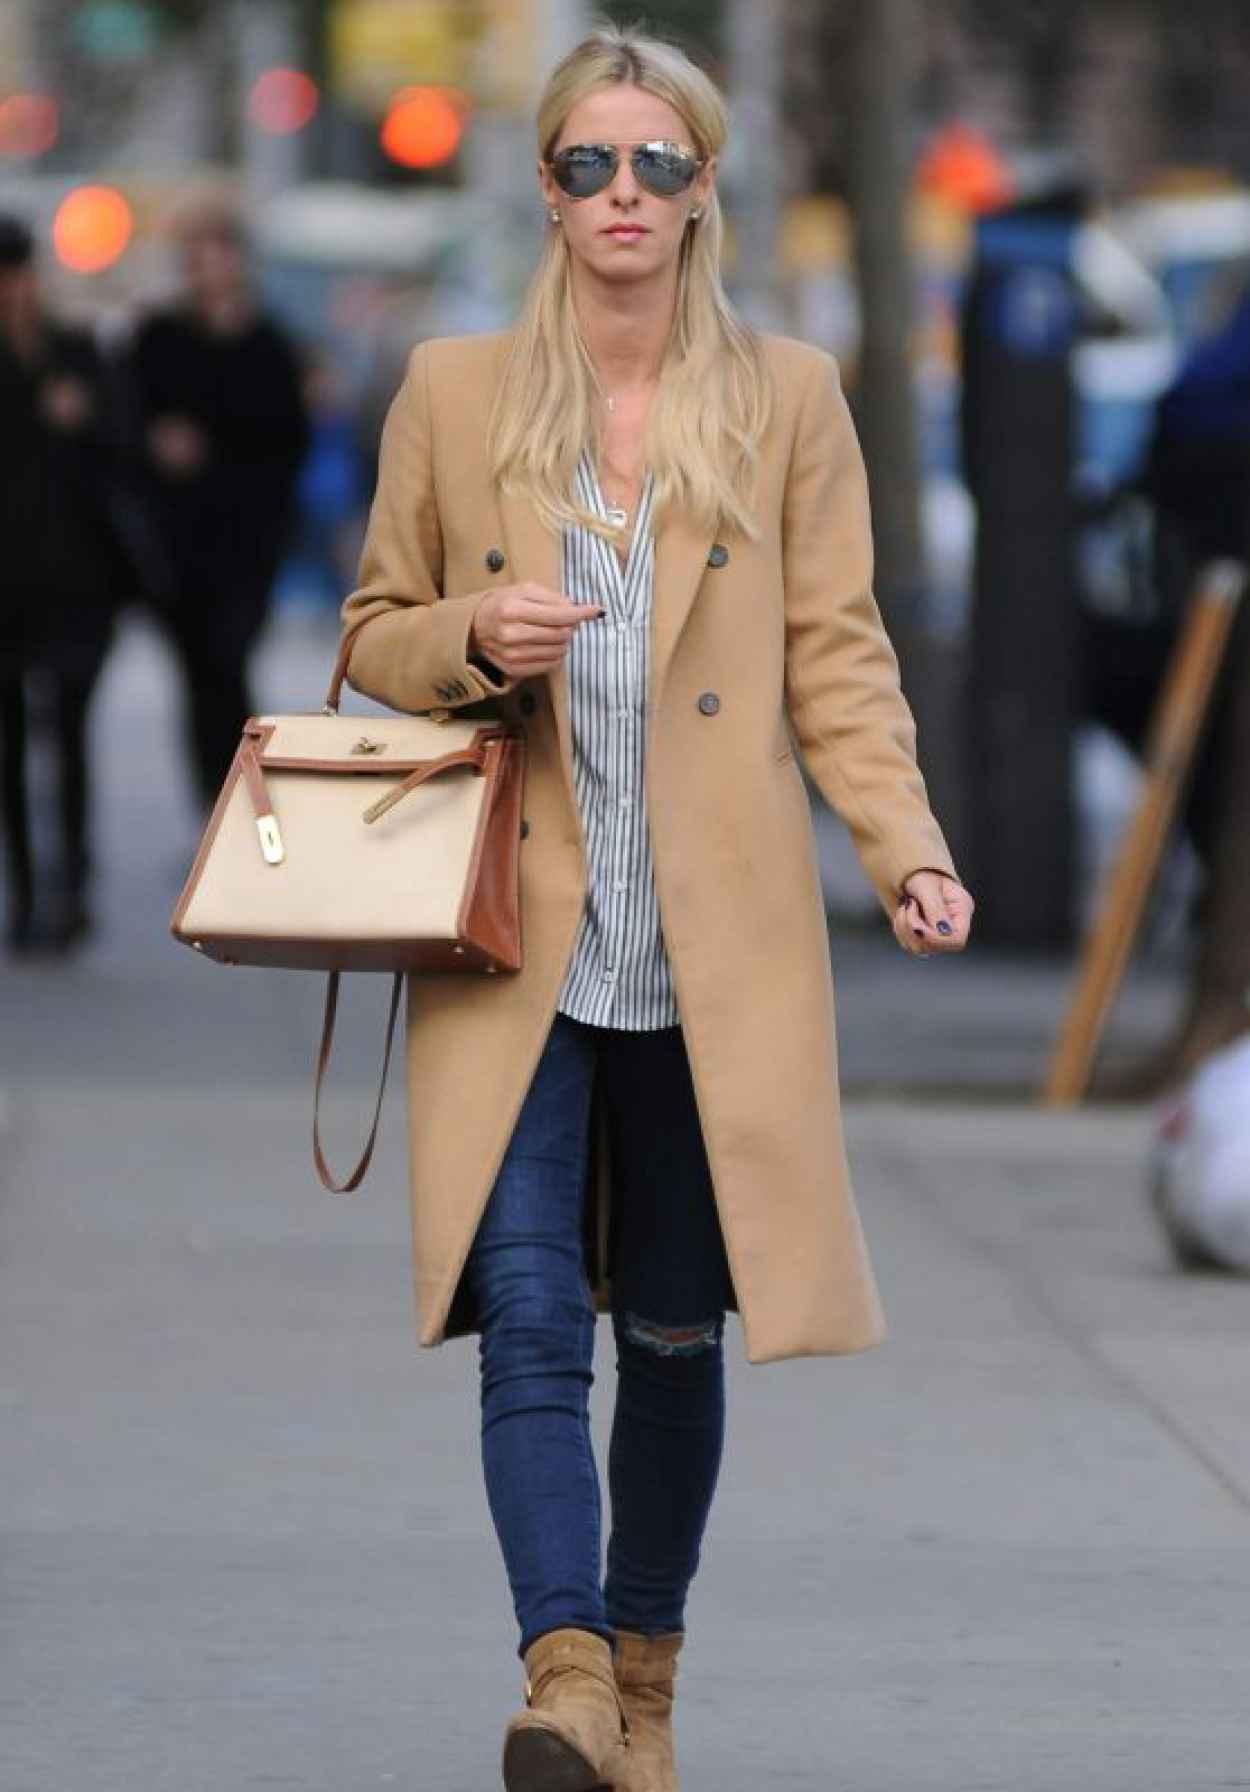 Nicky Hilton Rothschild Street Style - New York City, October 2015-1